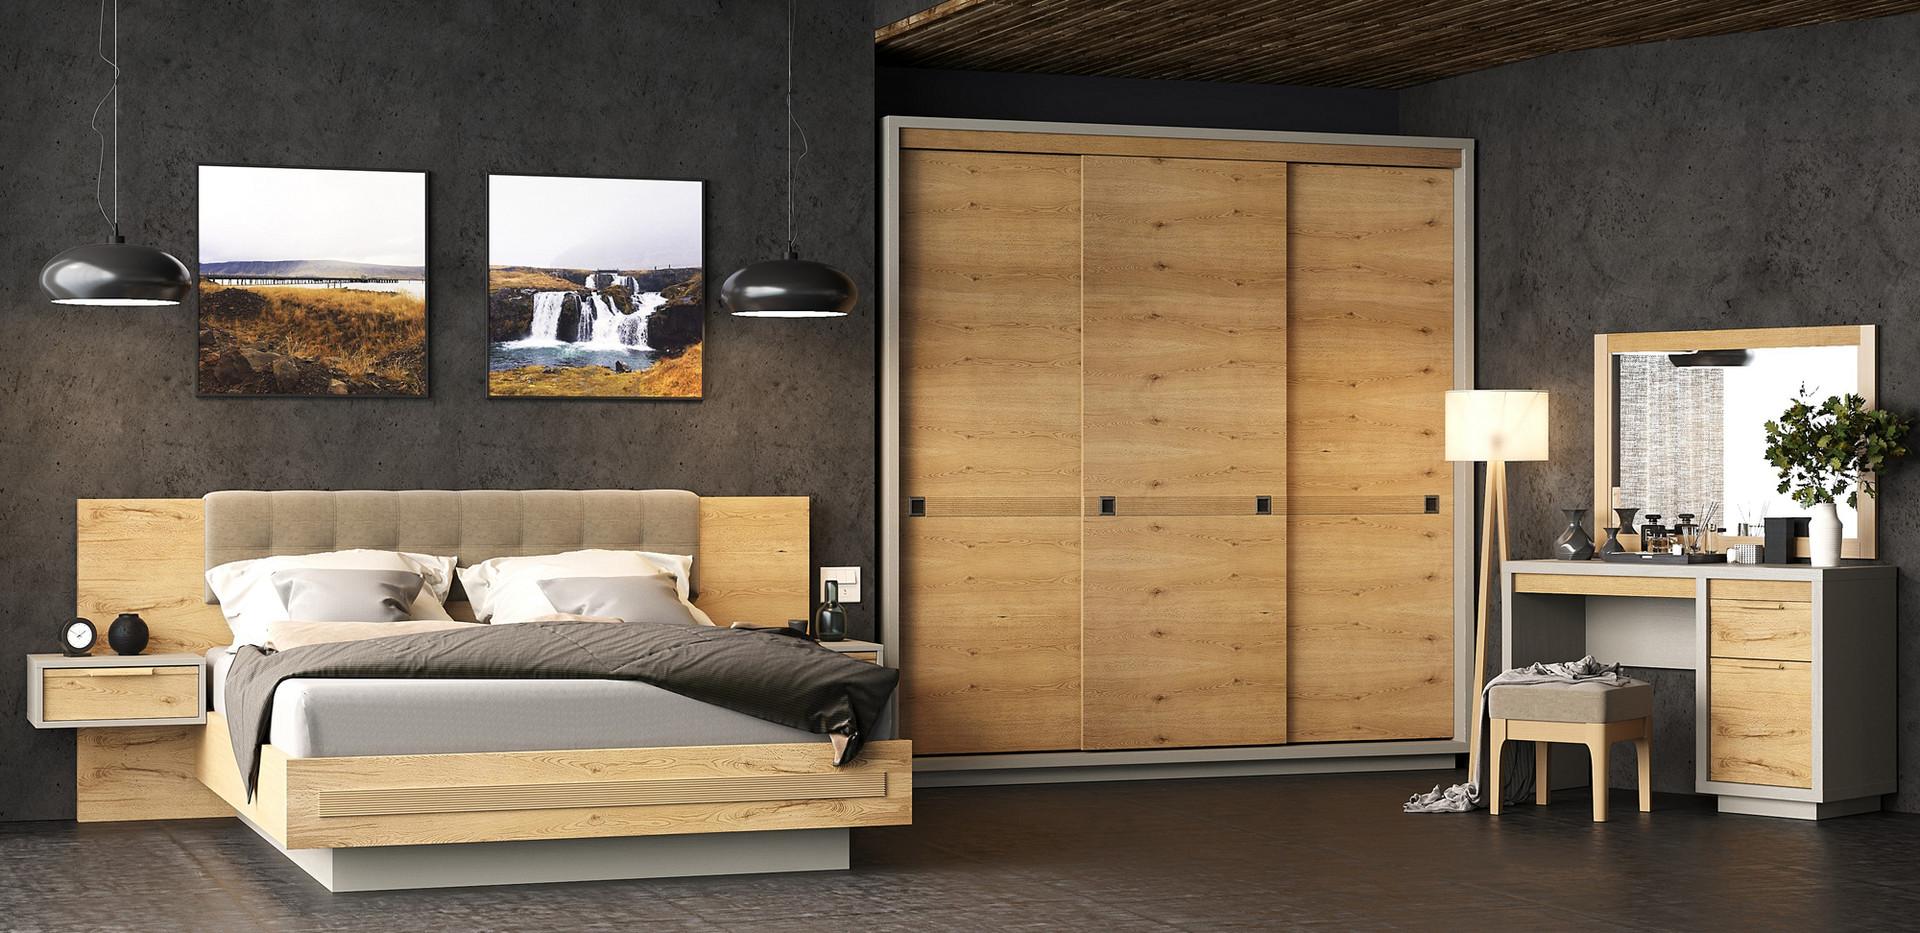 Bedroom_09.jpg